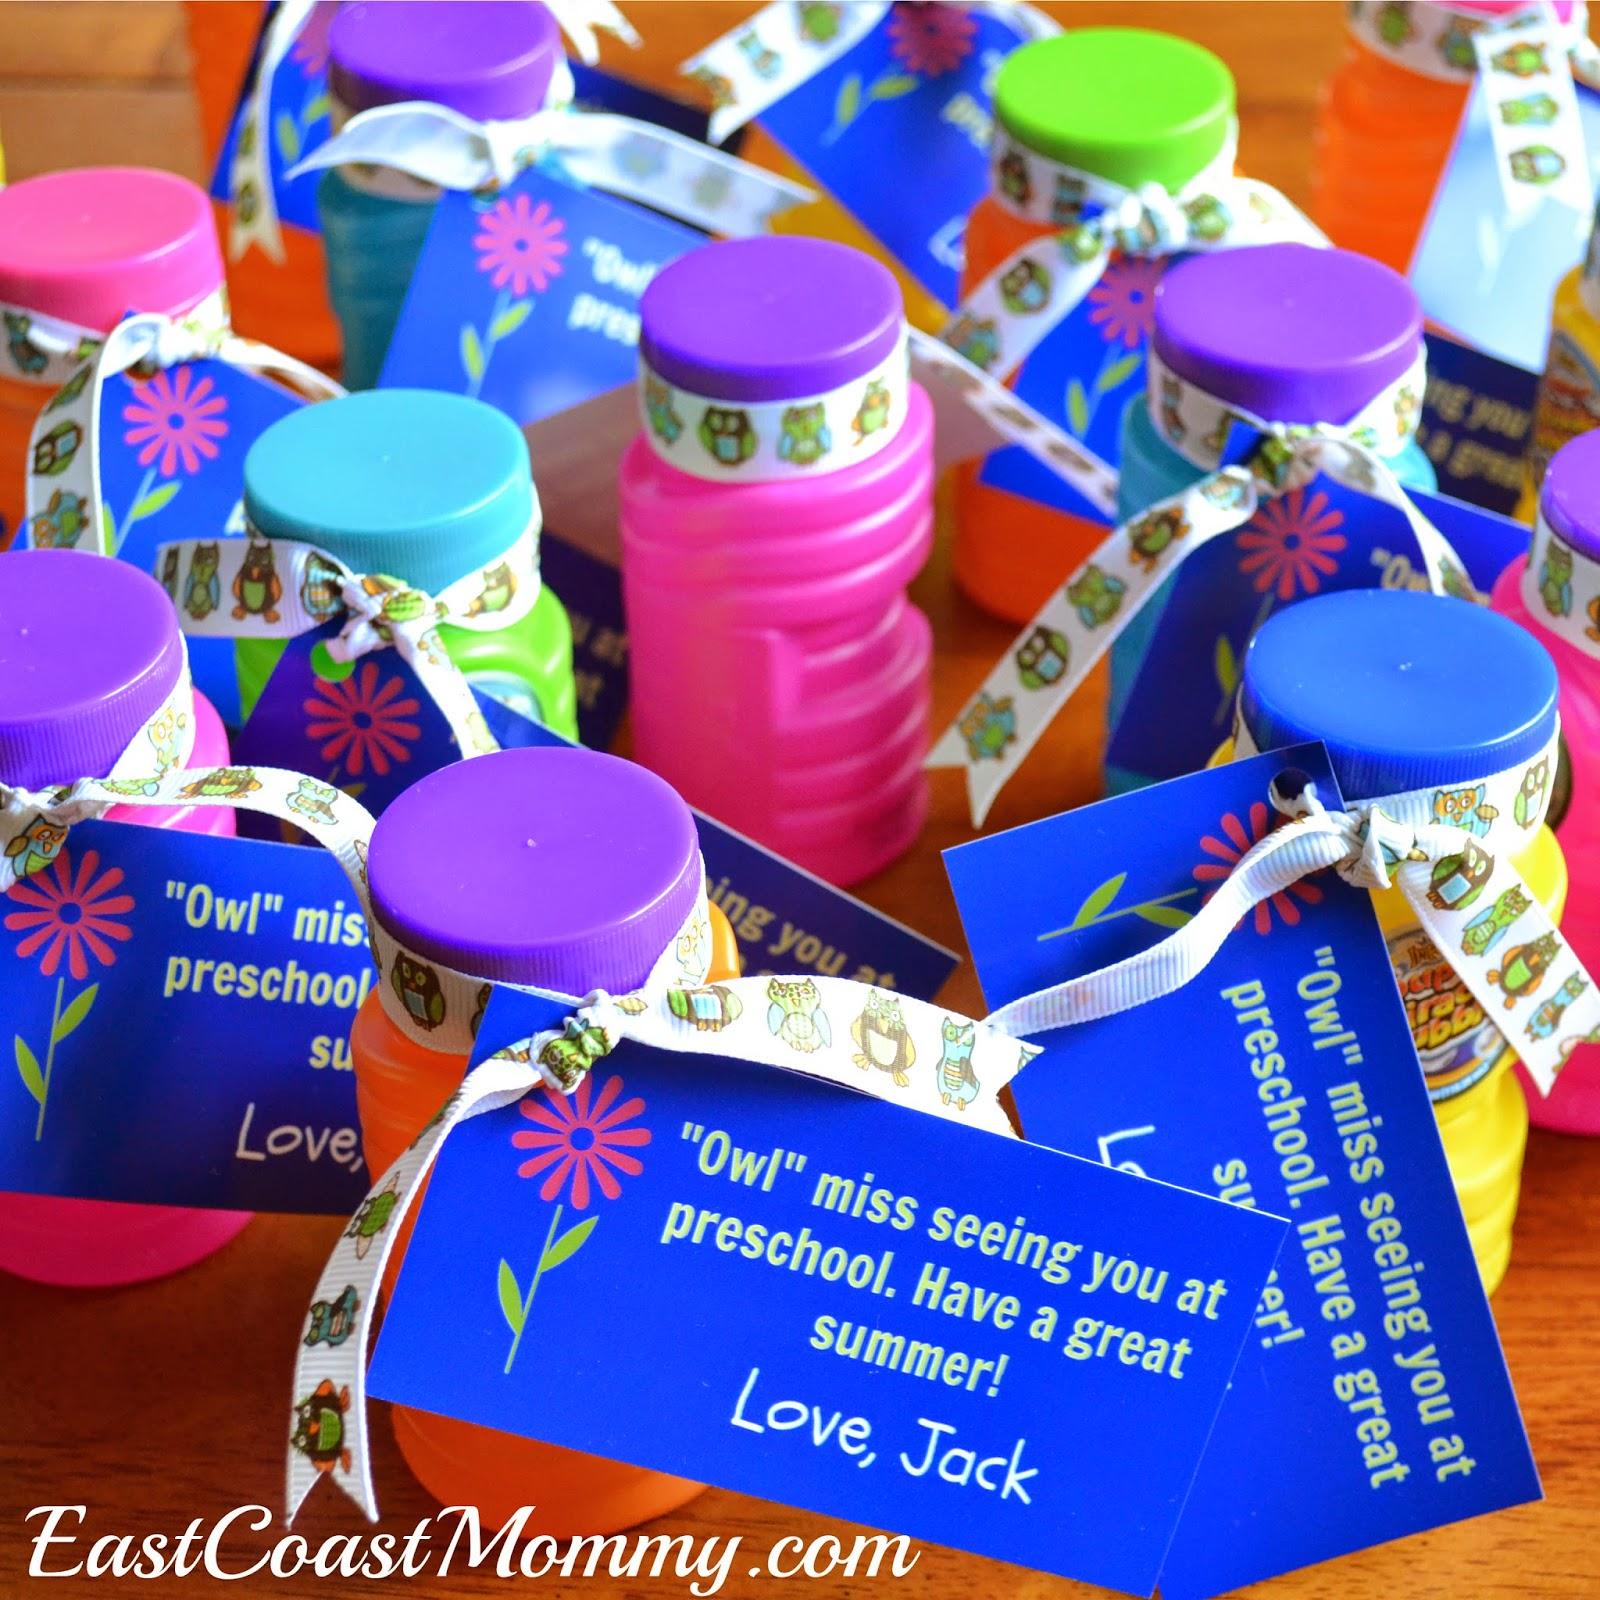 math worksheet : east coast mommy celebrating the last day of preschool : First Day Of School Gift For Preschool Teacher